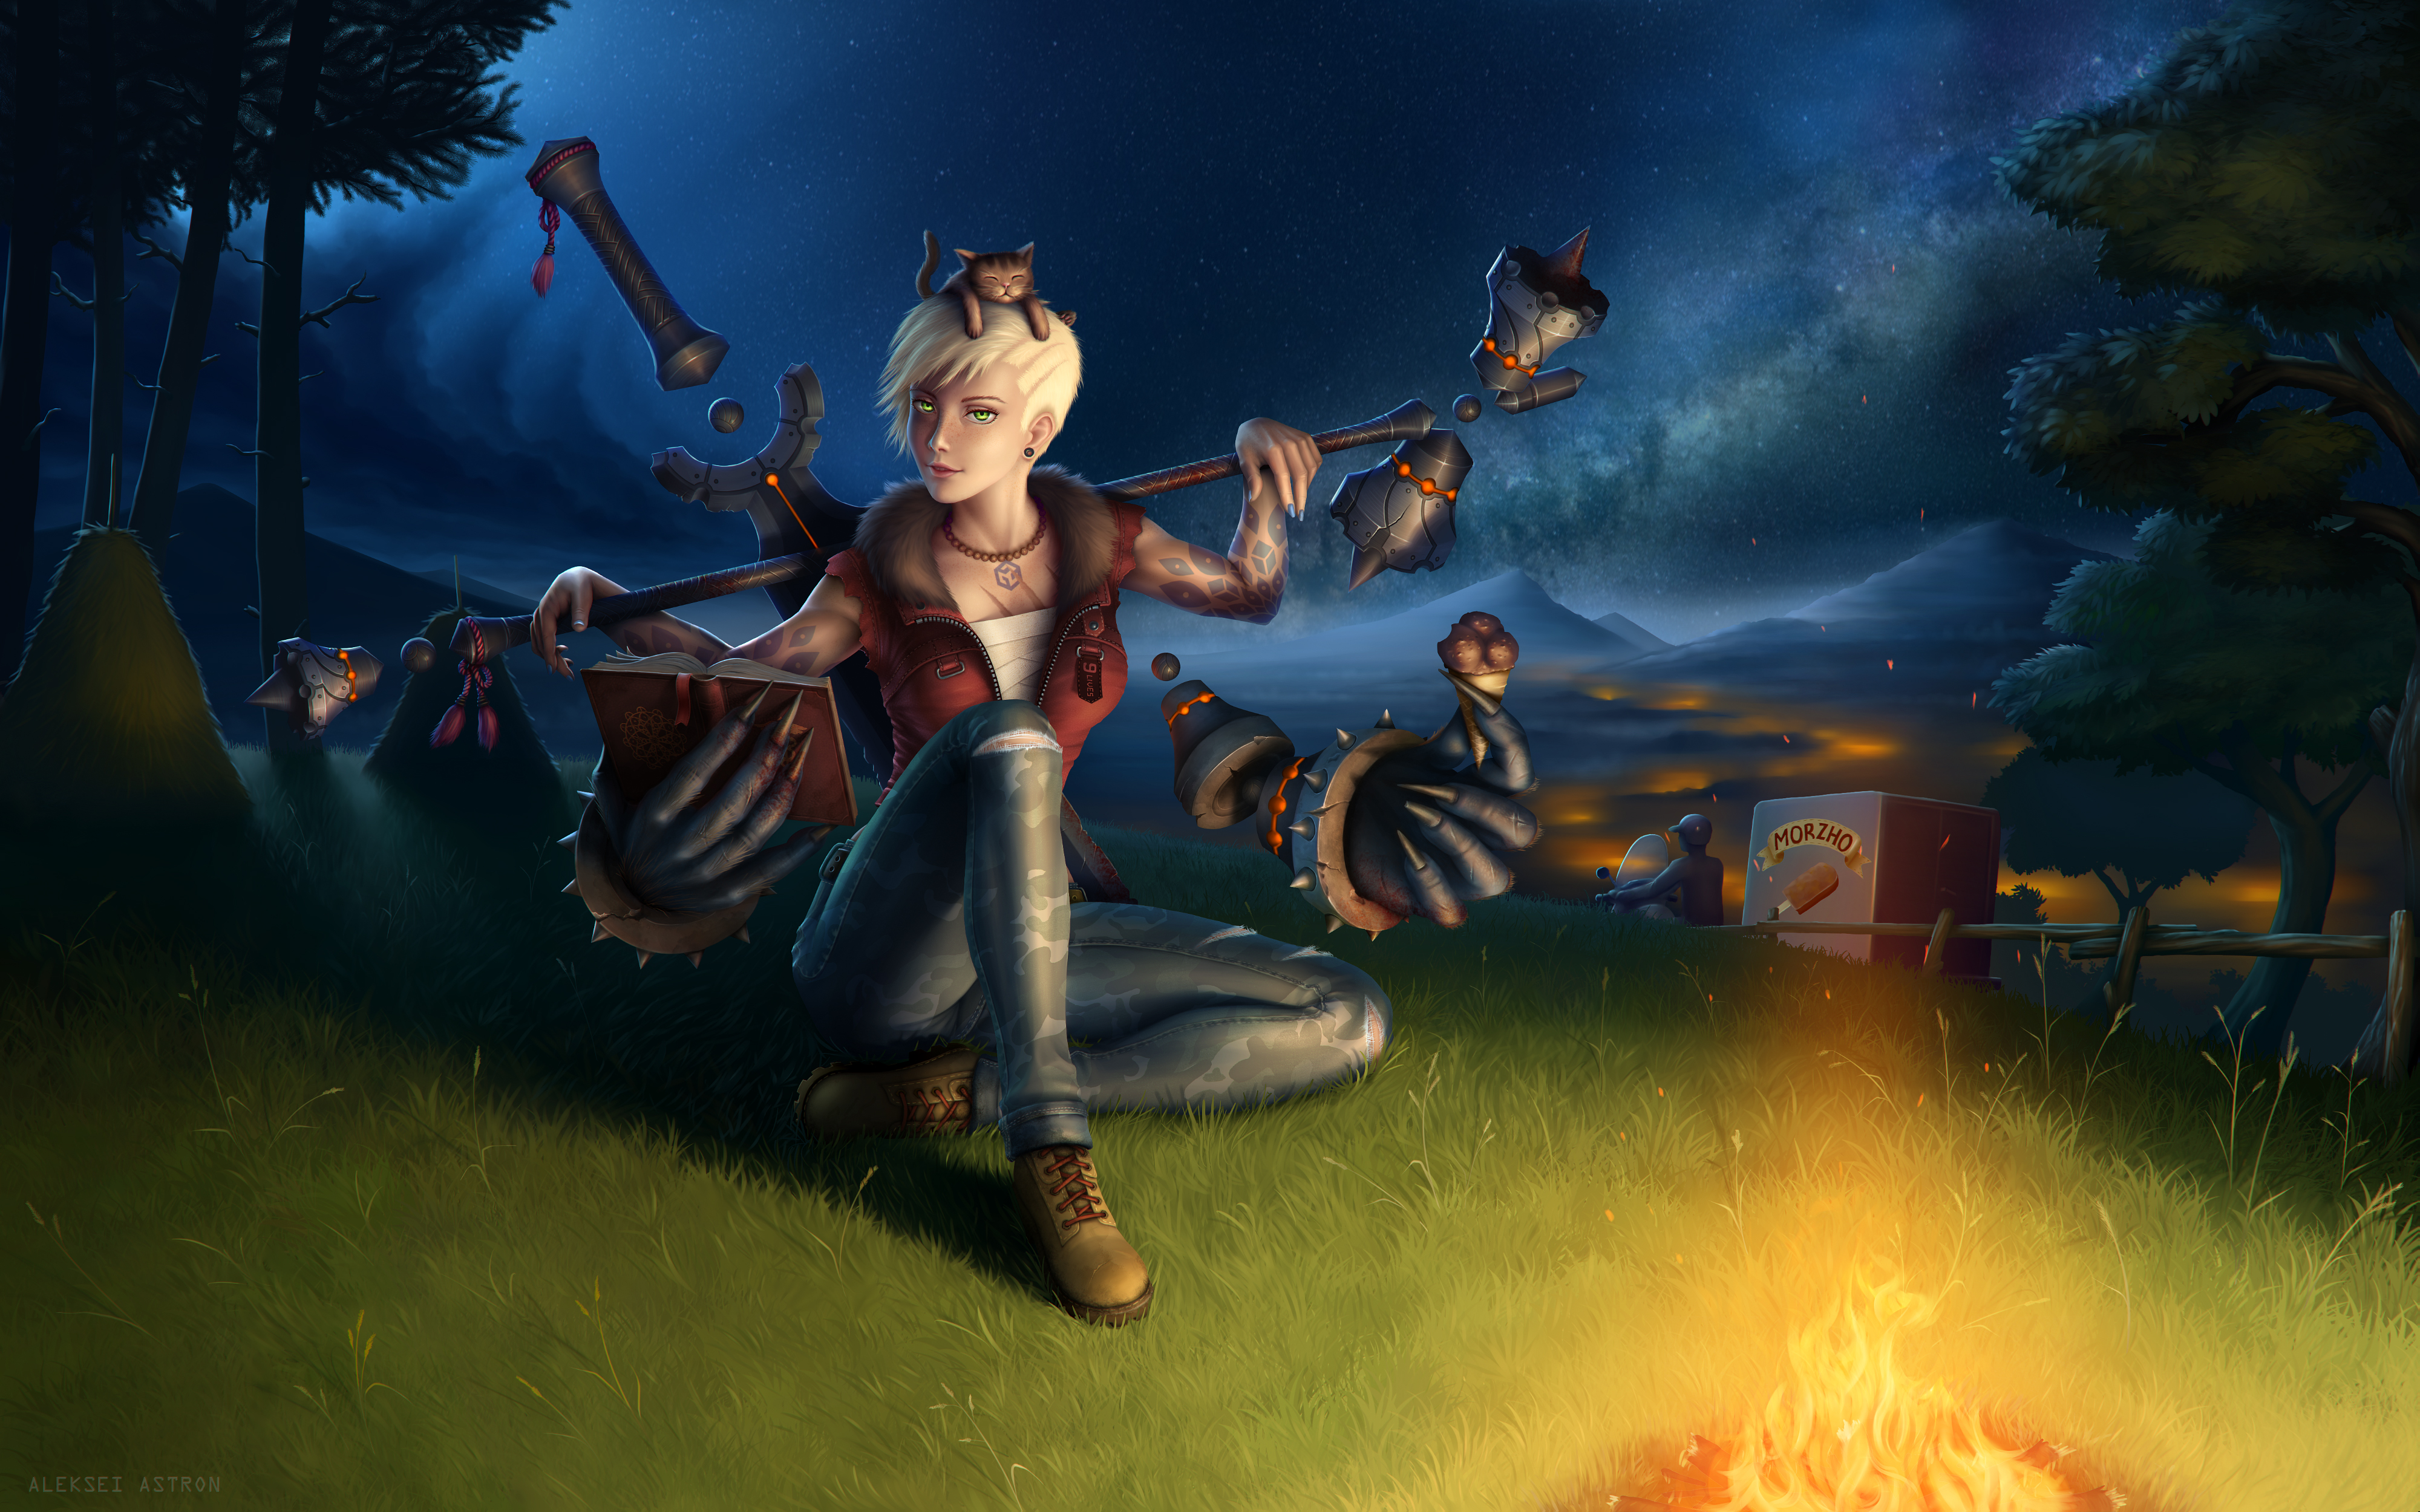 Indra by onitonari